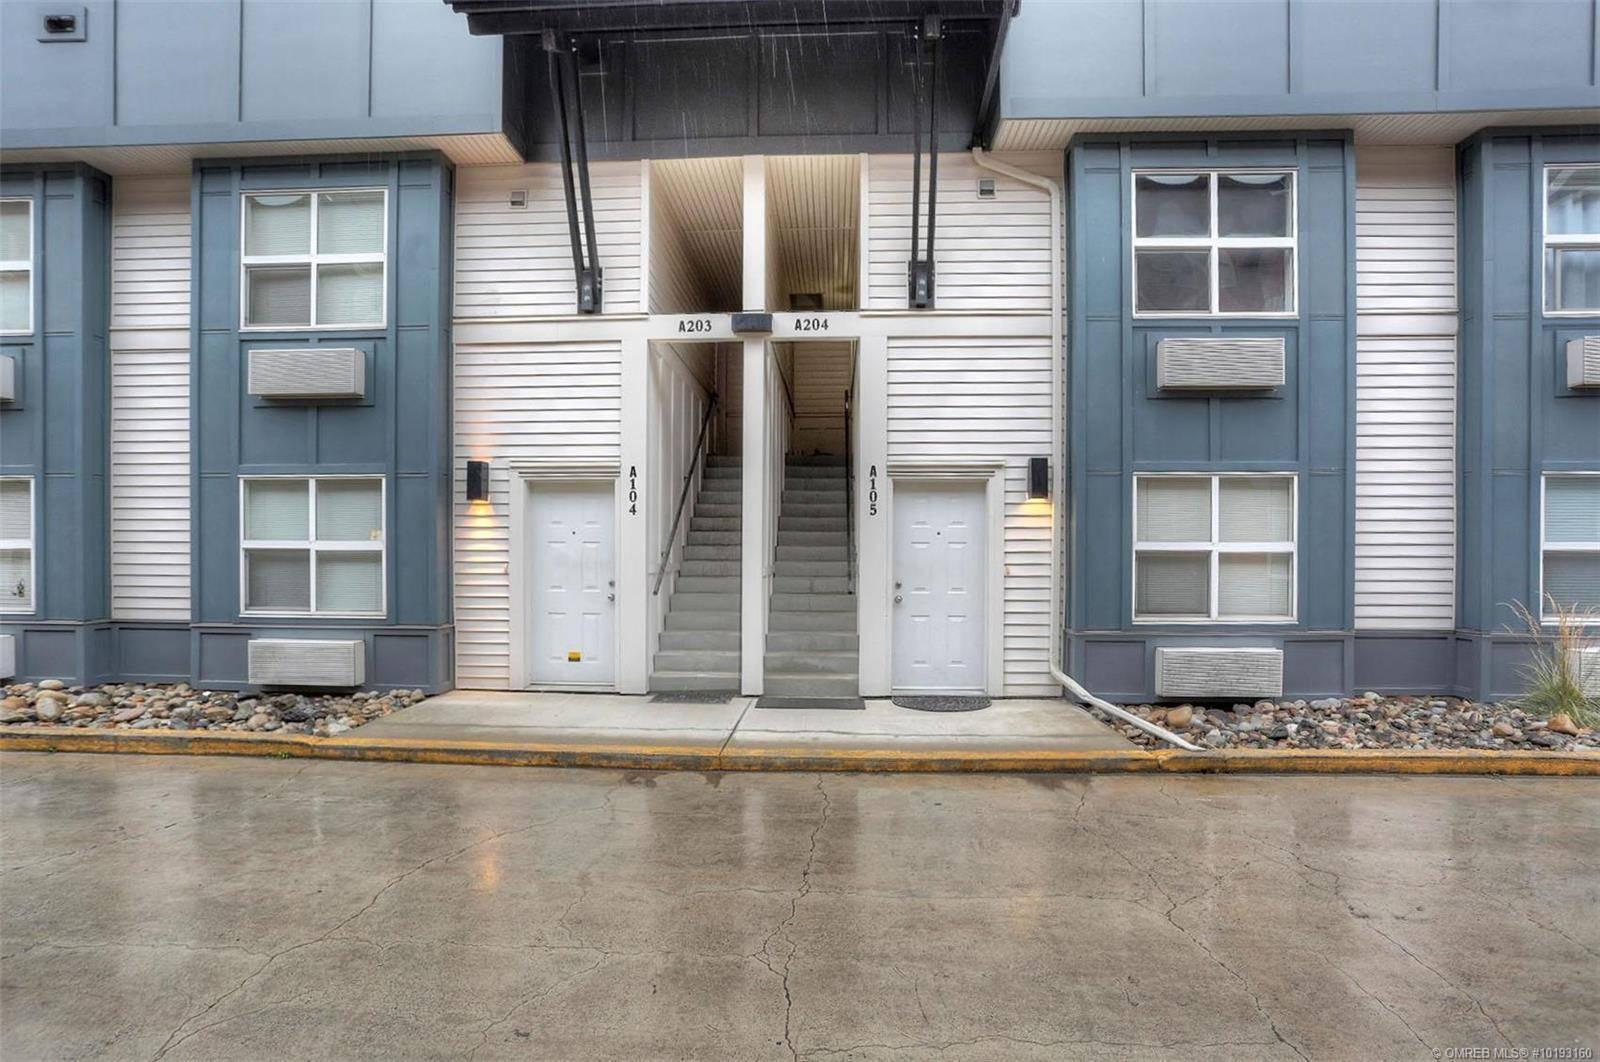 Condo for sale at 1475 Glenmore Rd Unit 204a Kelowna British Columbia - MLS: 10193160